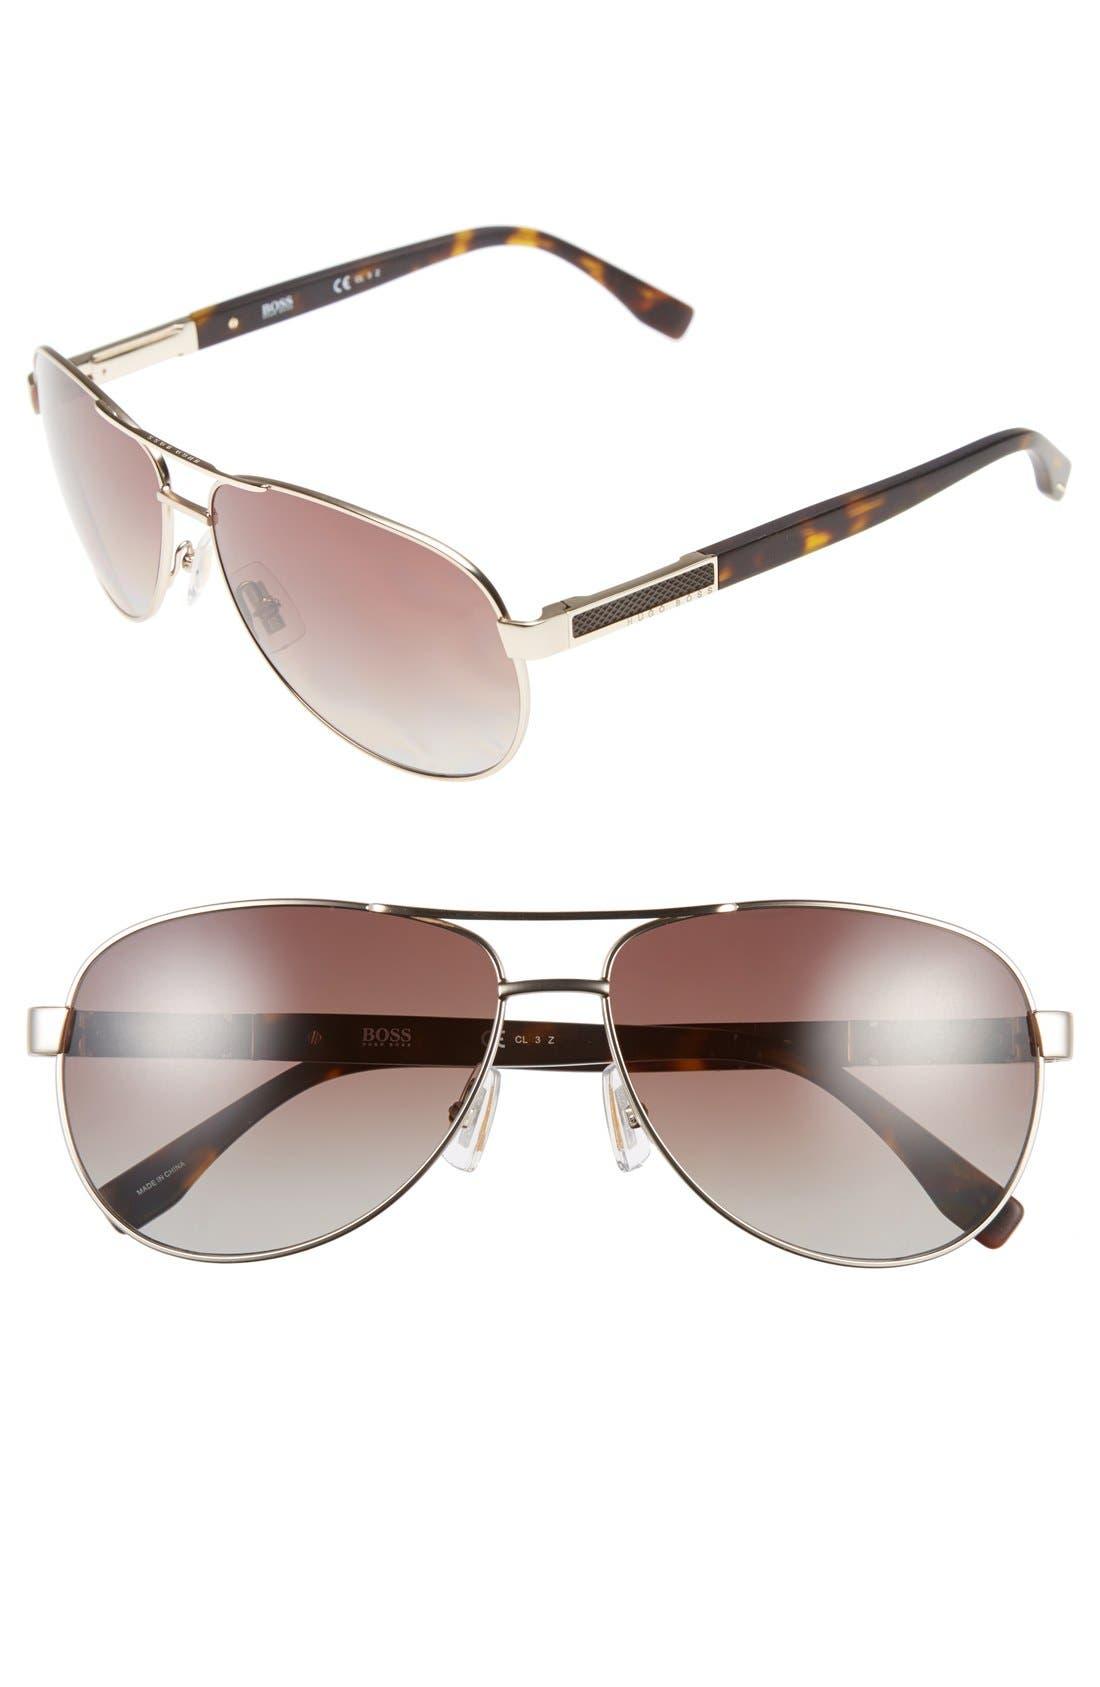 62mm Polarized Aviator Sunglasses,                             Main thumbnail 1, color,                             Semi Matte Light Gold/ Brown